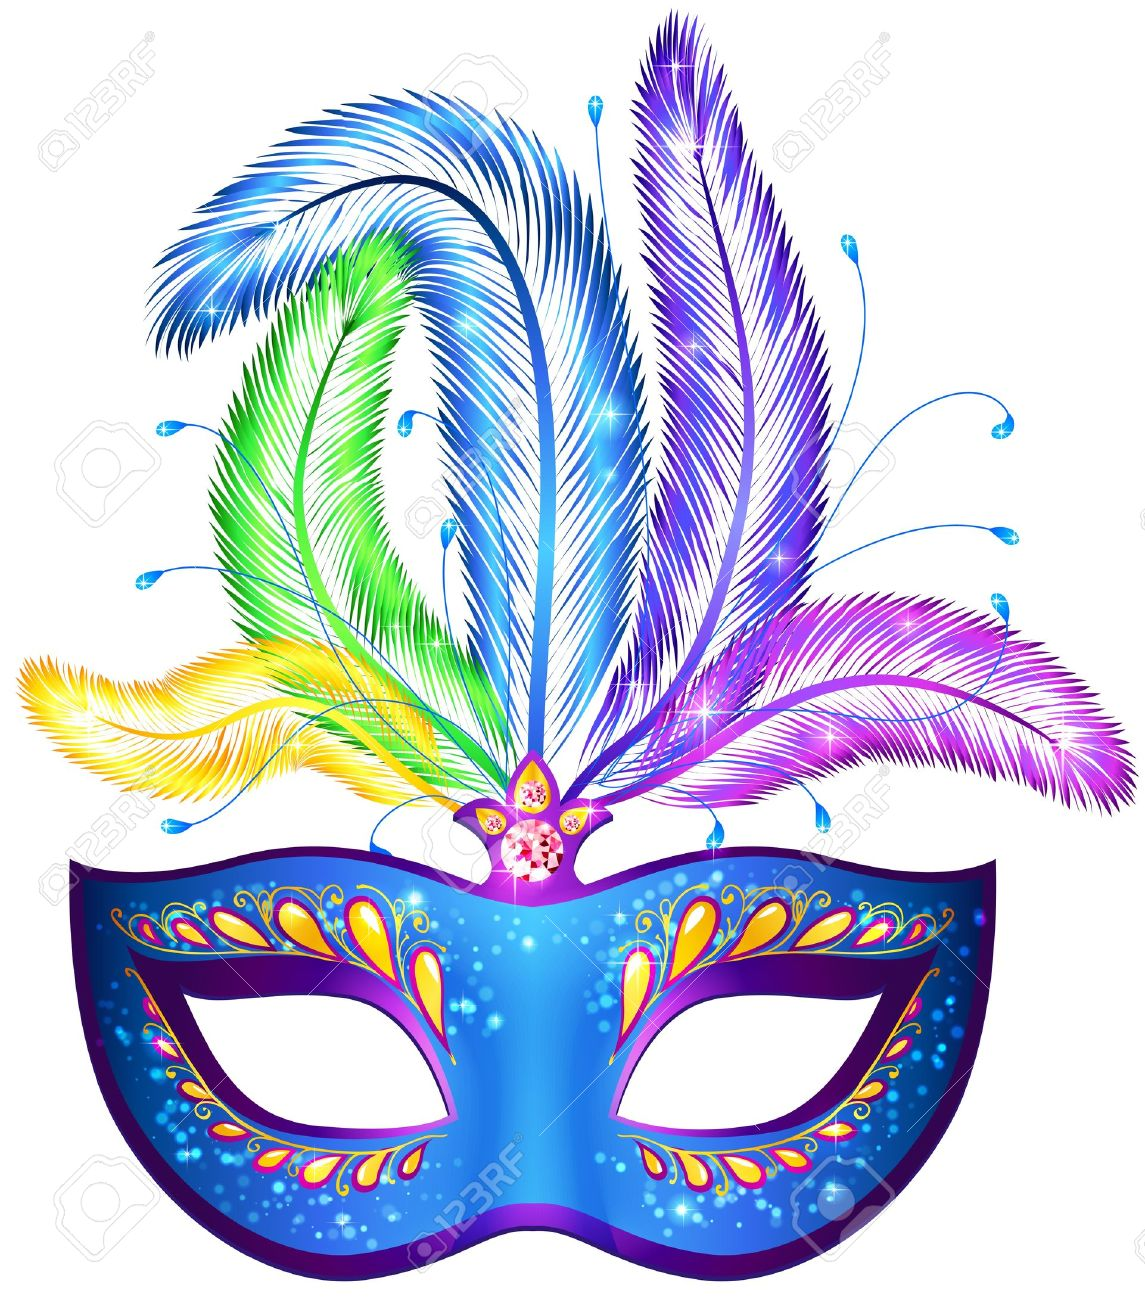 Vector azul adornado carnaval veneciano máscara de plumas.